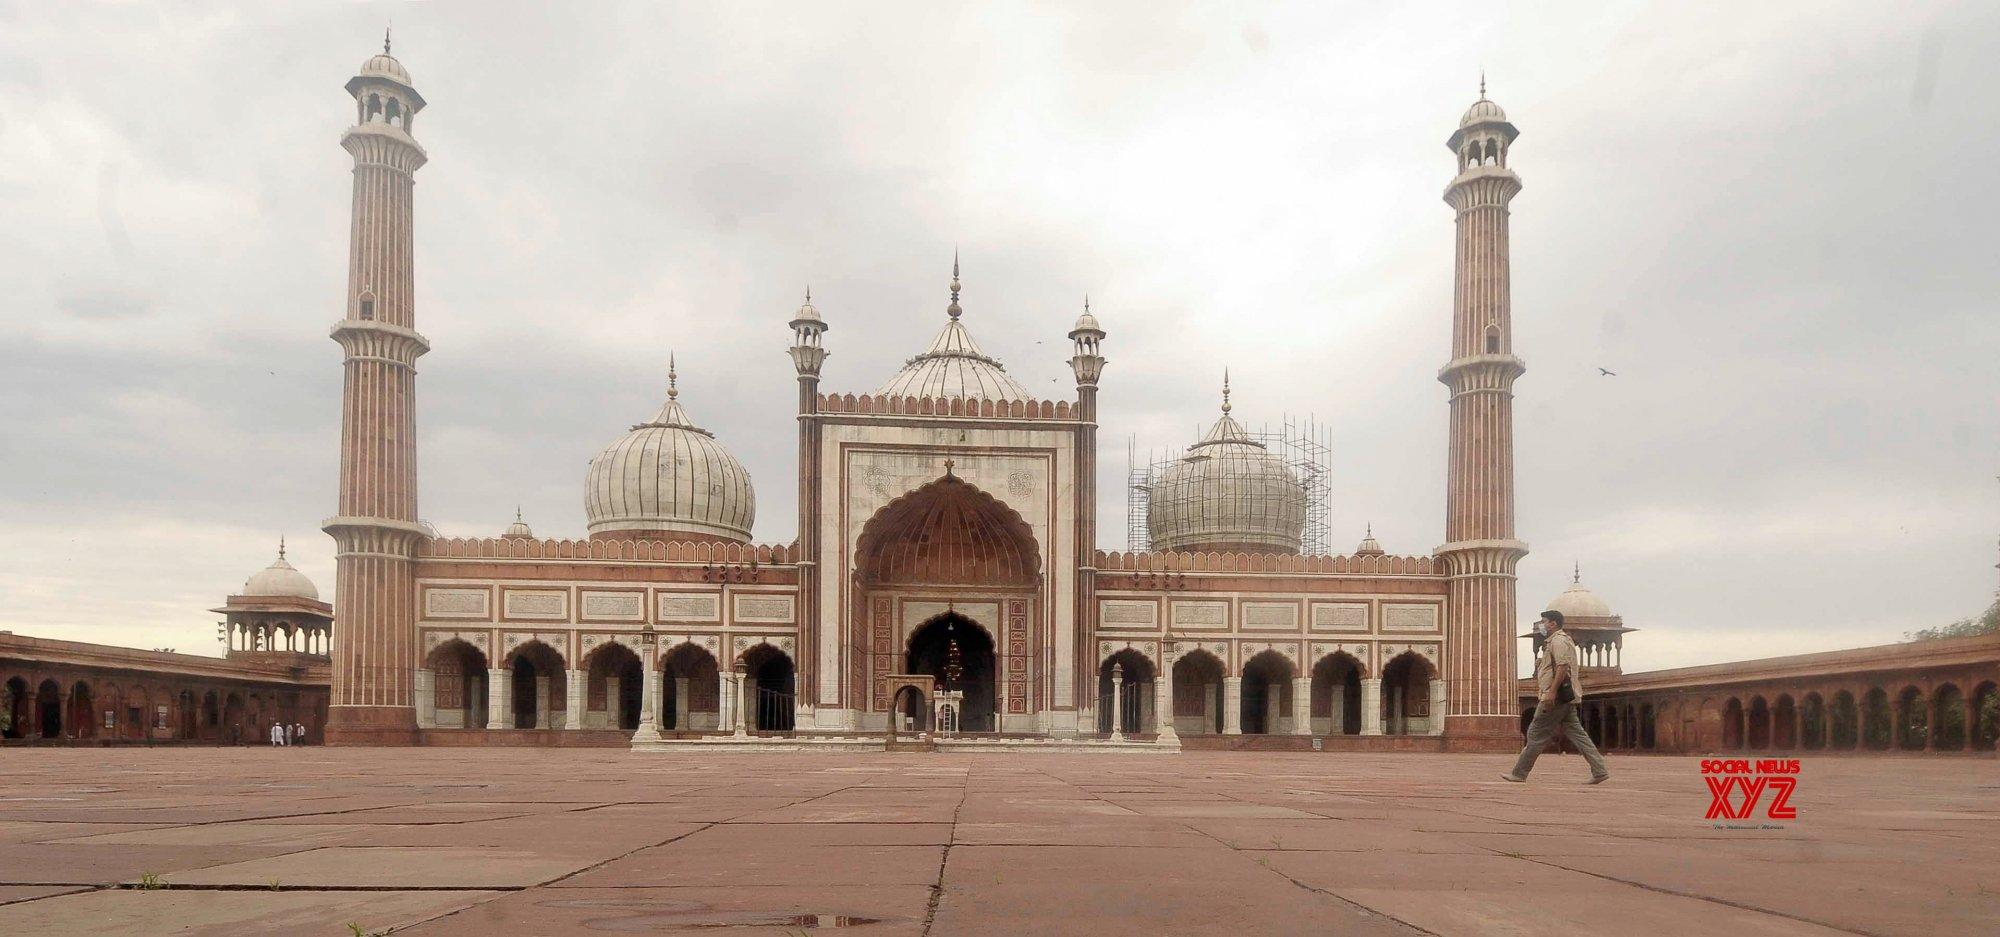 New Delhi Deserted Jama Masjid During Lockdown On Ramadan Eve